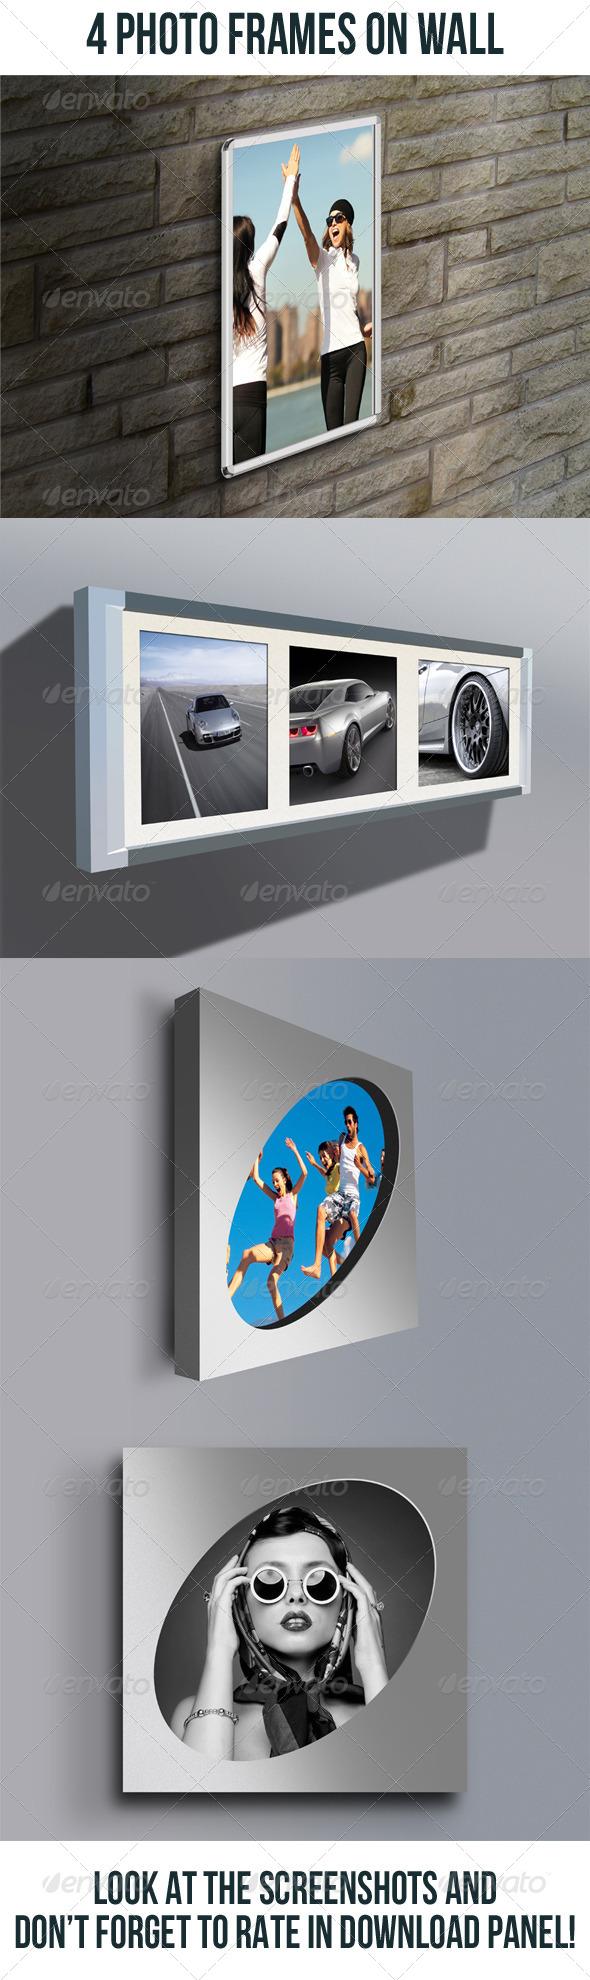 4 Photo Frames On Wall Bundle - Artistic Photo Templates